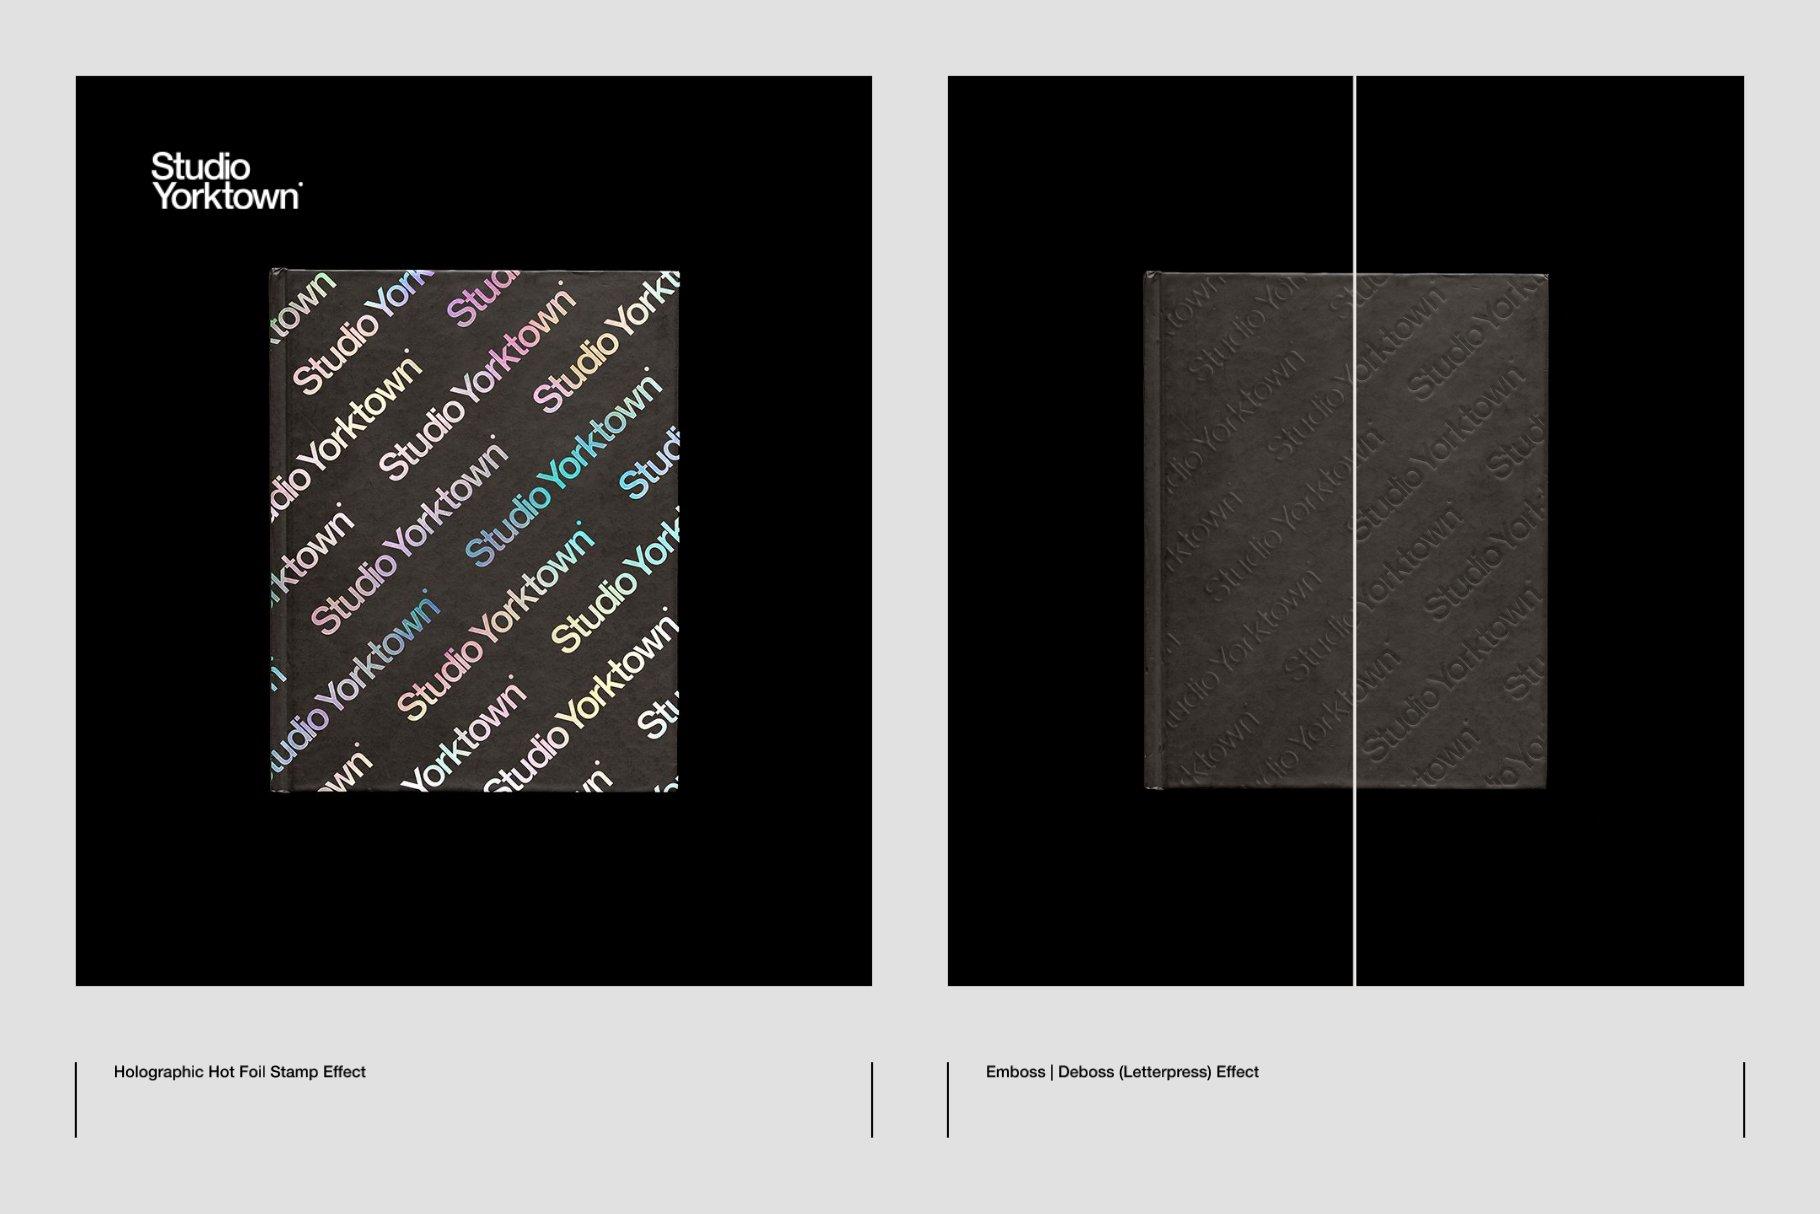 Honbako 逼真全息箔页面卷曲书籍设计PSD样机模板(4329)插图(8)